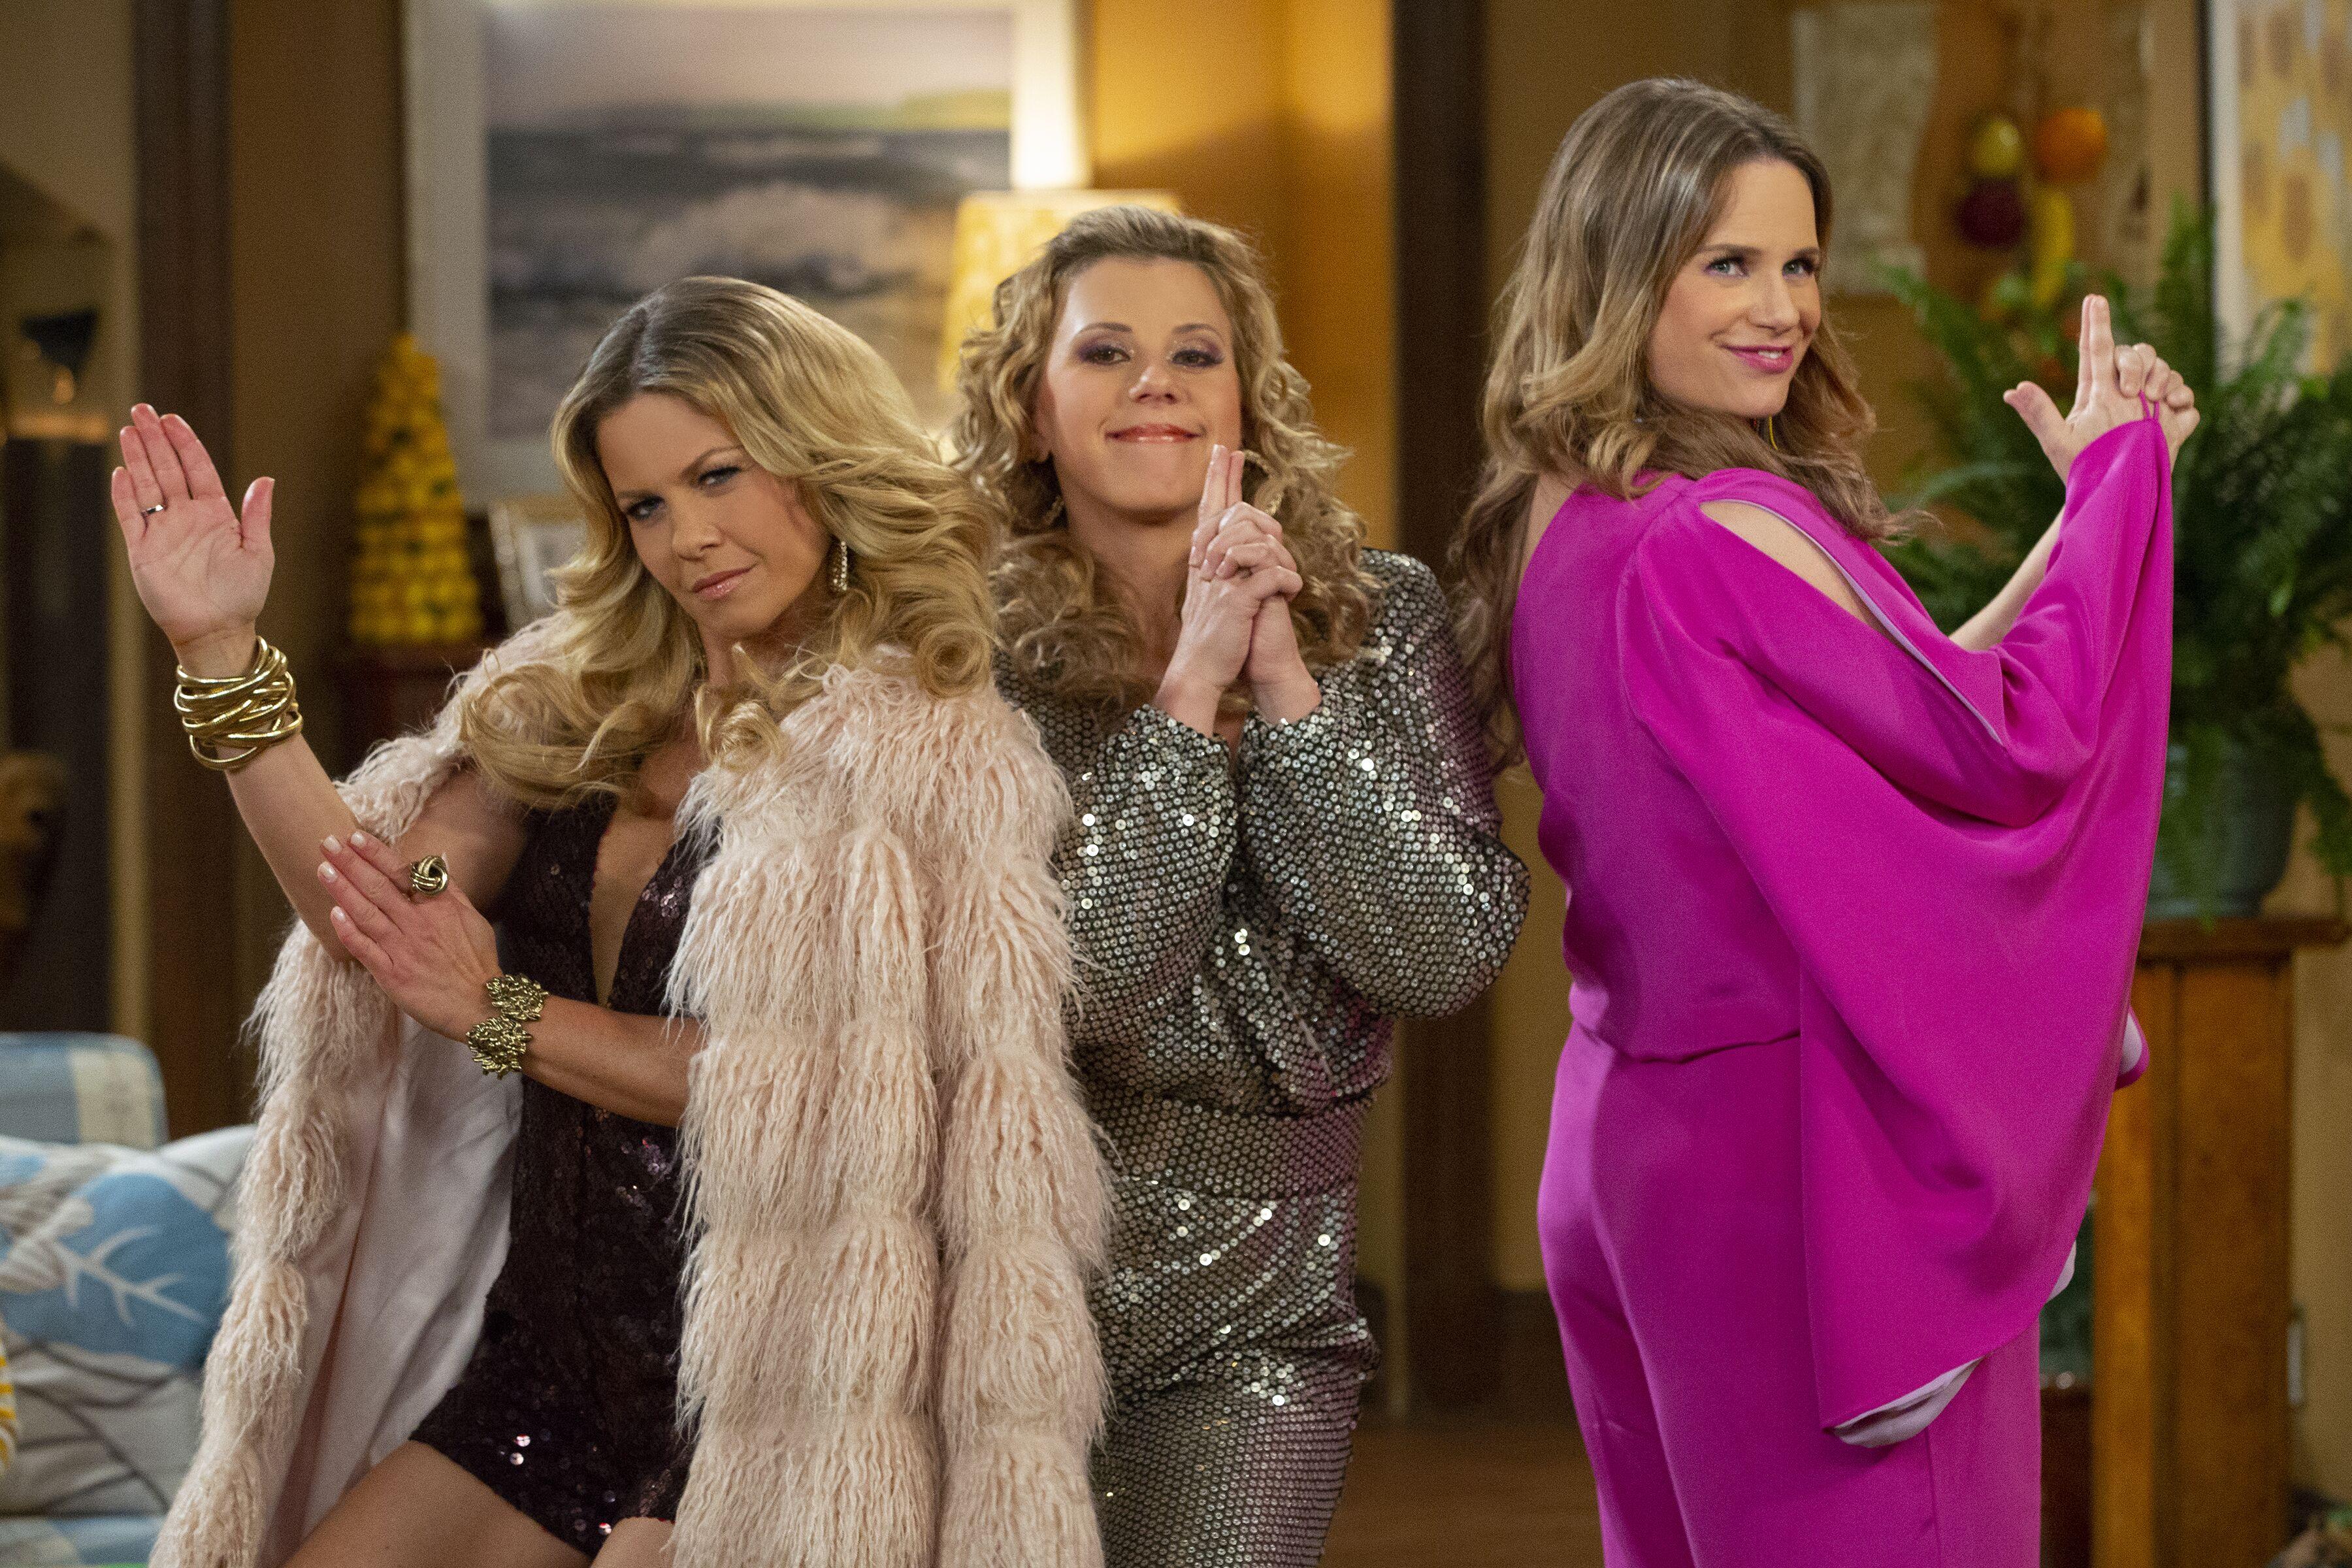 Fuller House season 5 officially wraps production